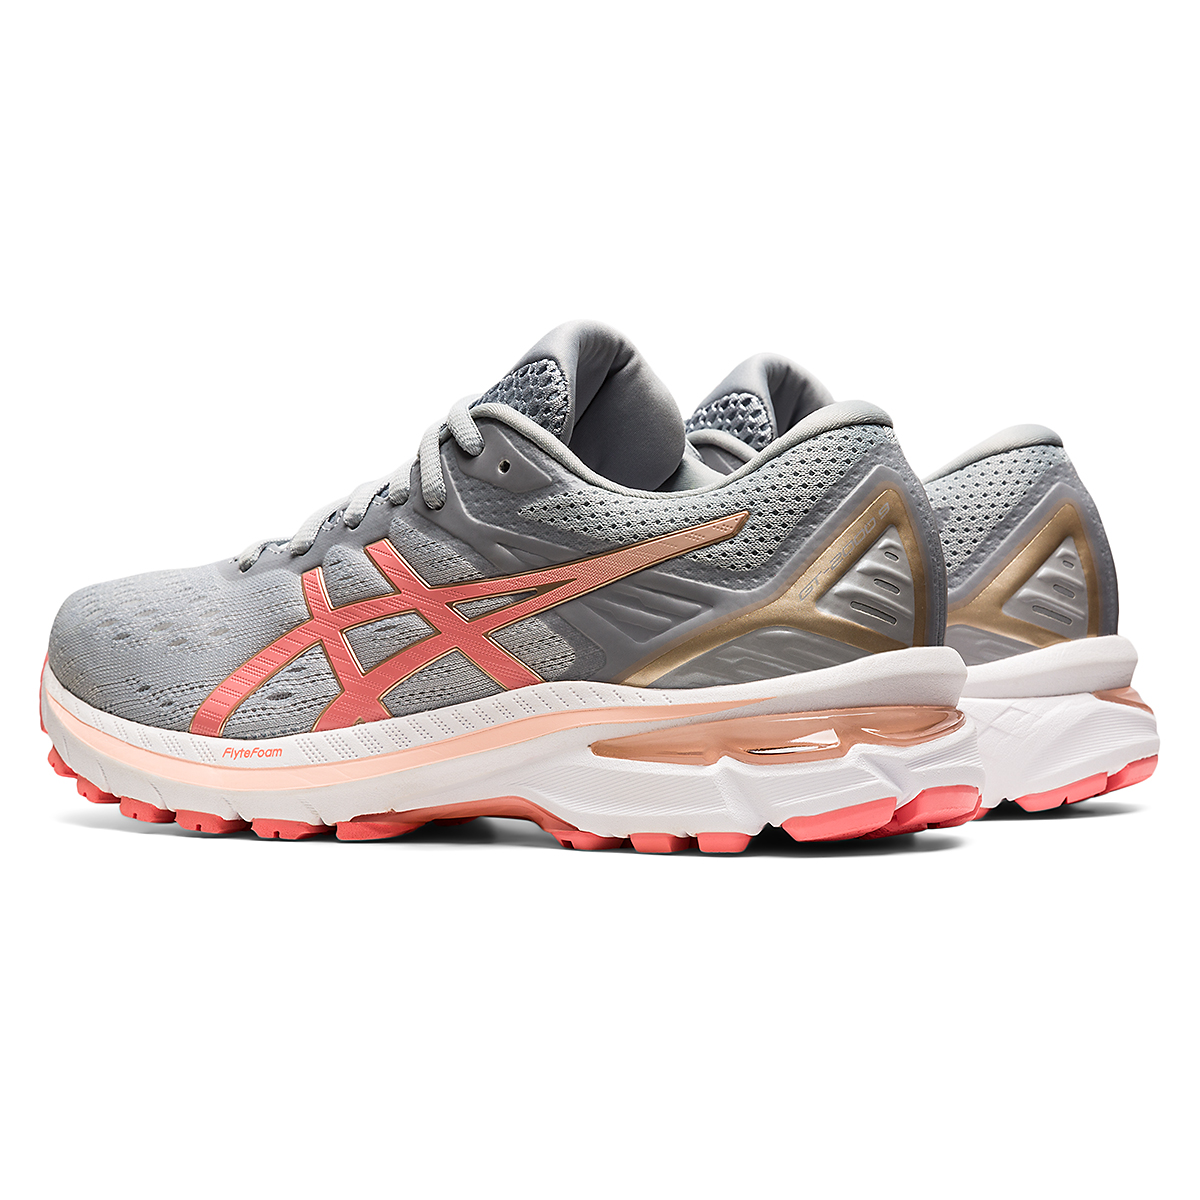 Women's Asics Gt-2000 9 Running Shoe - Color: Piedmont Grey - Size: 5 - Width: Regular, Piedmont Grey, large, image 4